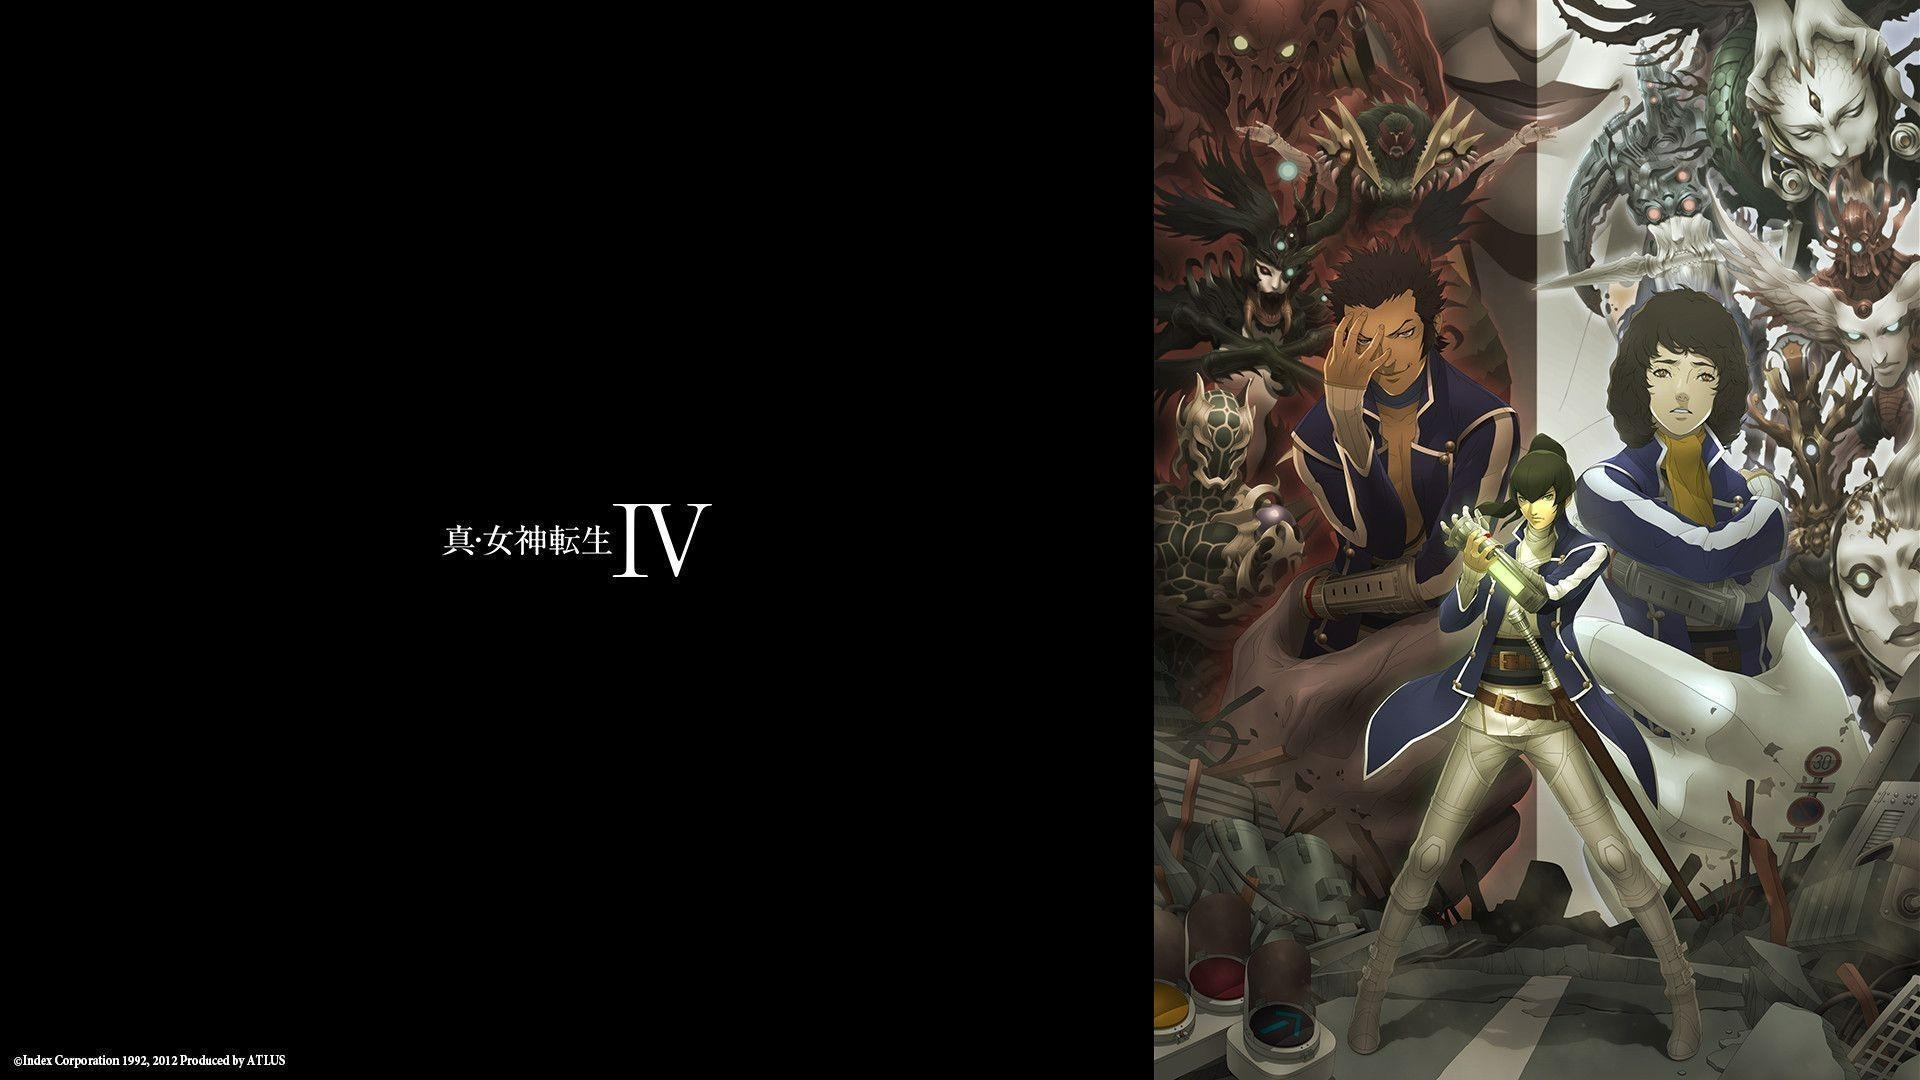 shin megami tensei wallpapers - wallpaper cave